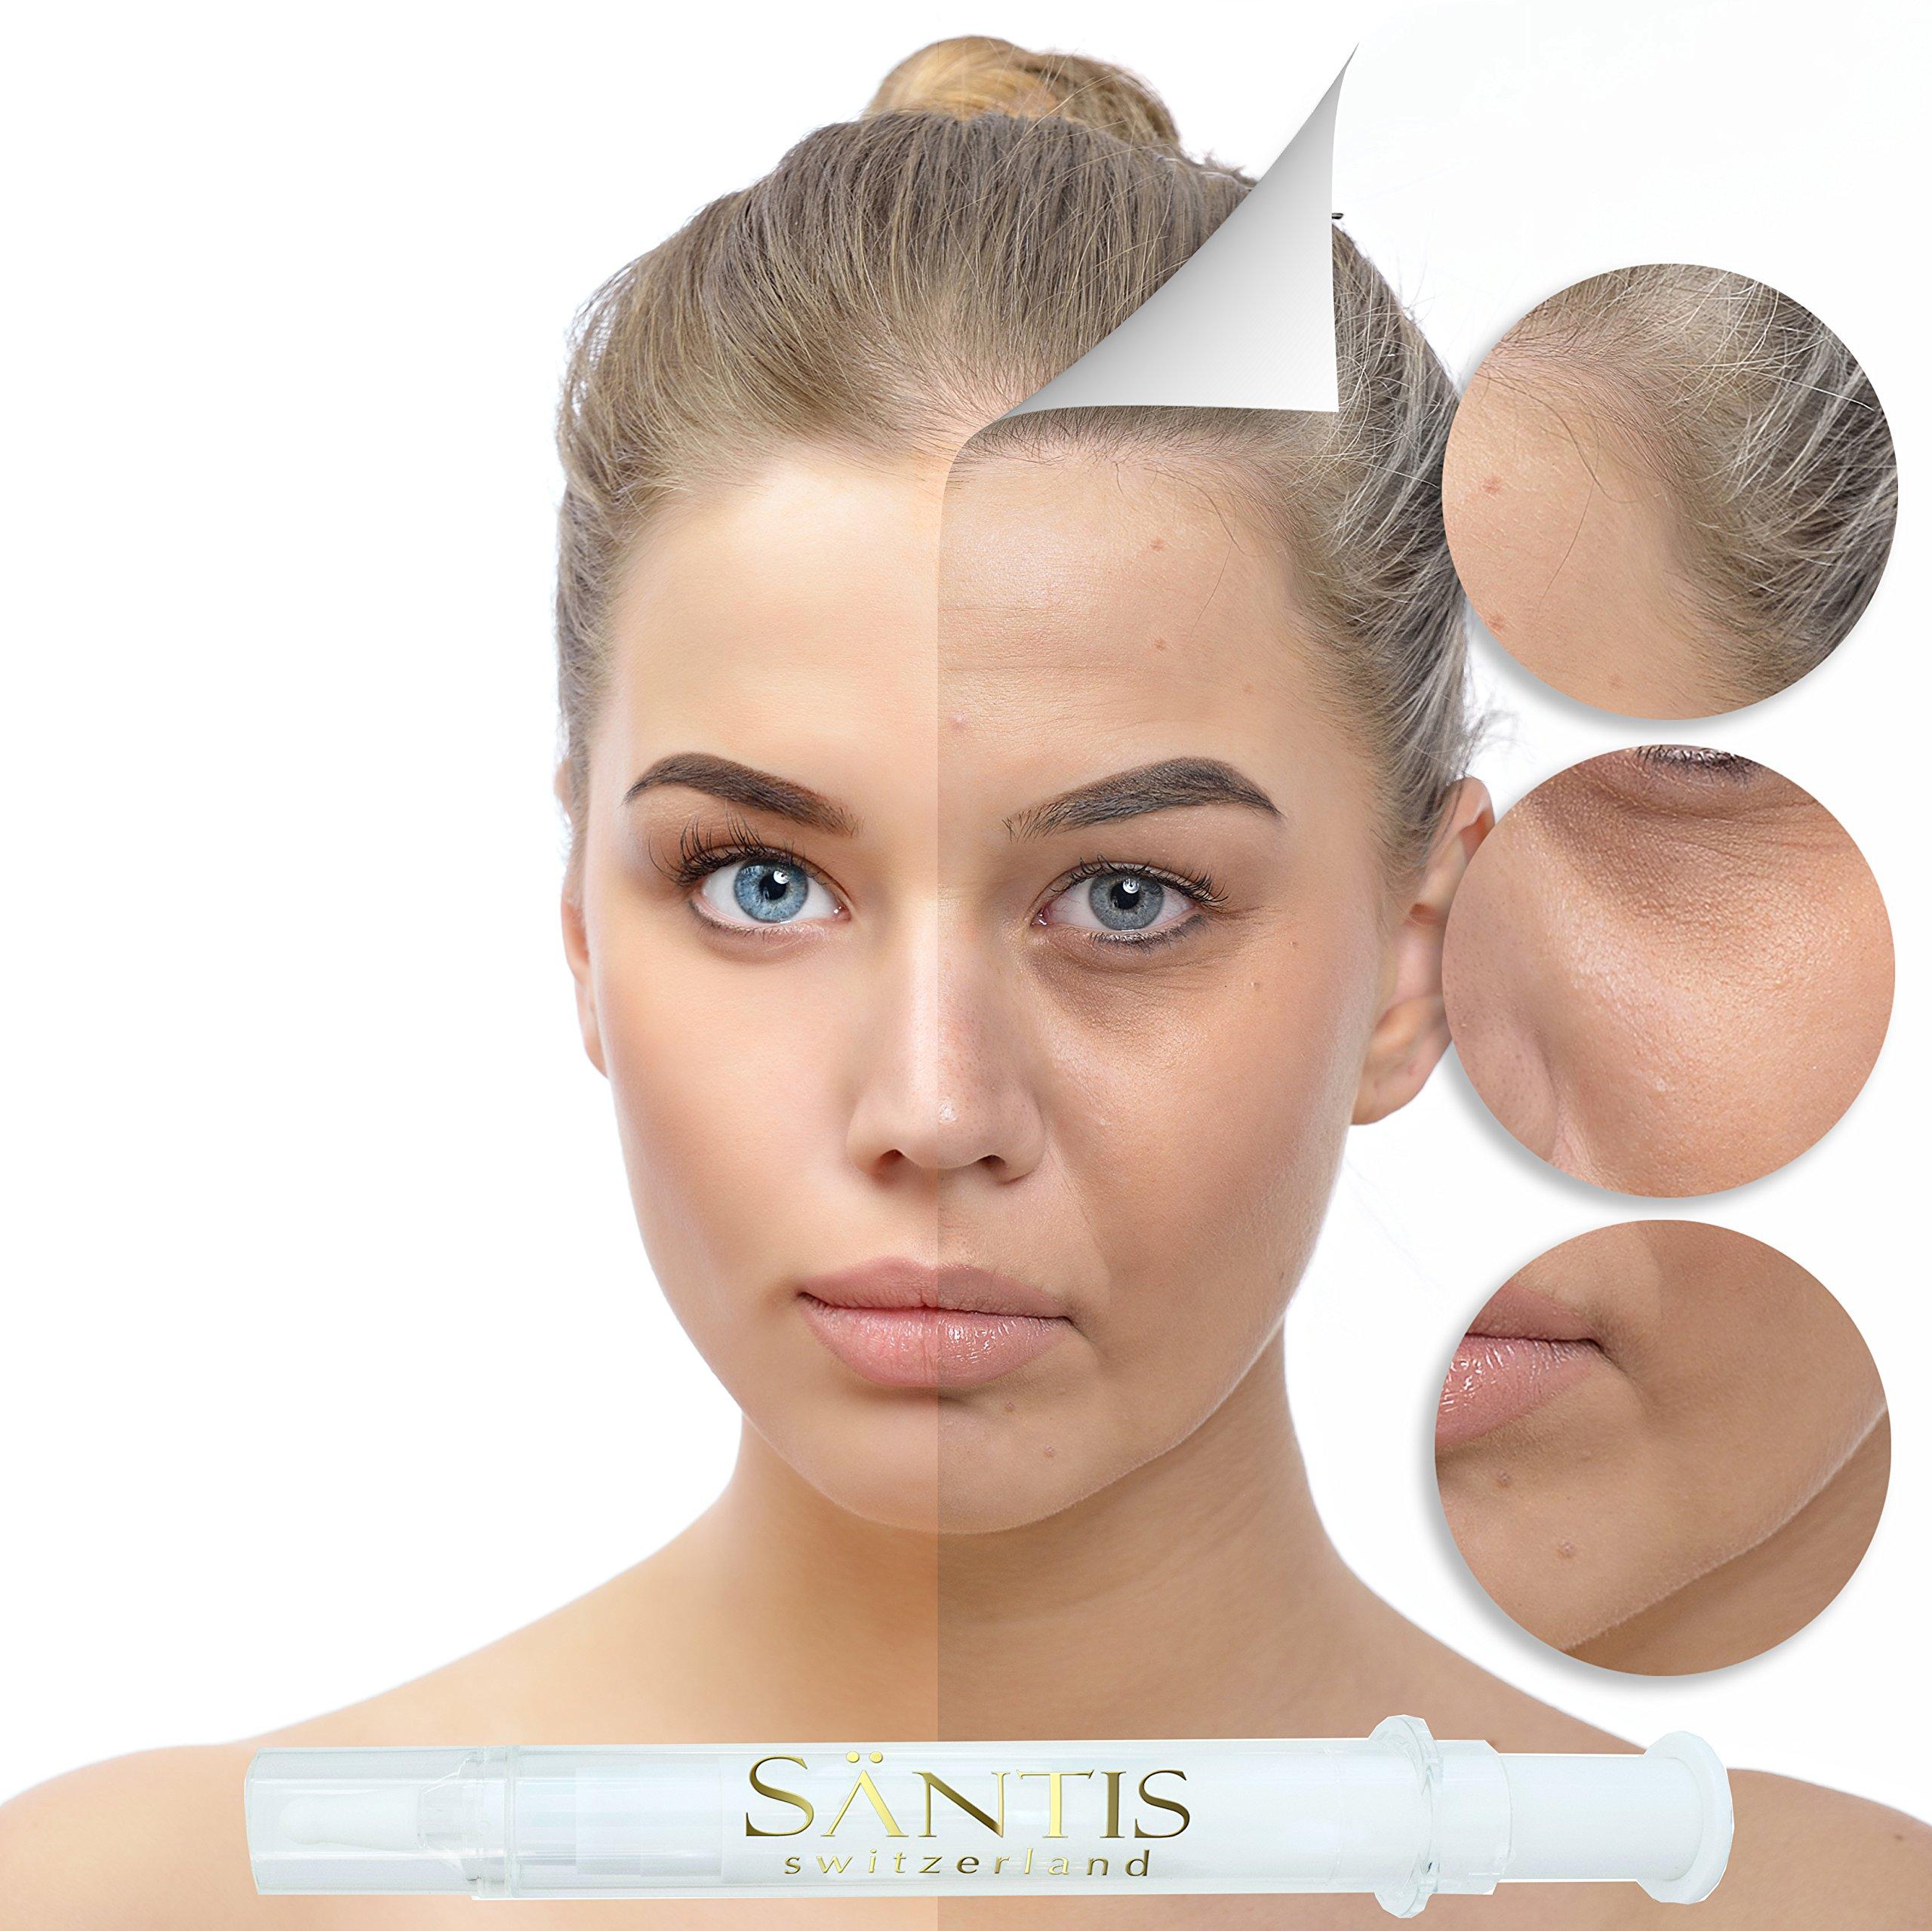 Santis Botox Alternative Anti Wrinkle Filler Kit Contain Cellular Serum & Filling Cream Tightens Skin Instantly & Painlessly - Eliminates Age Spots, Dark Circles, Smoothens Fine Lines by SANTIS SWITZERLAND (Image #3)